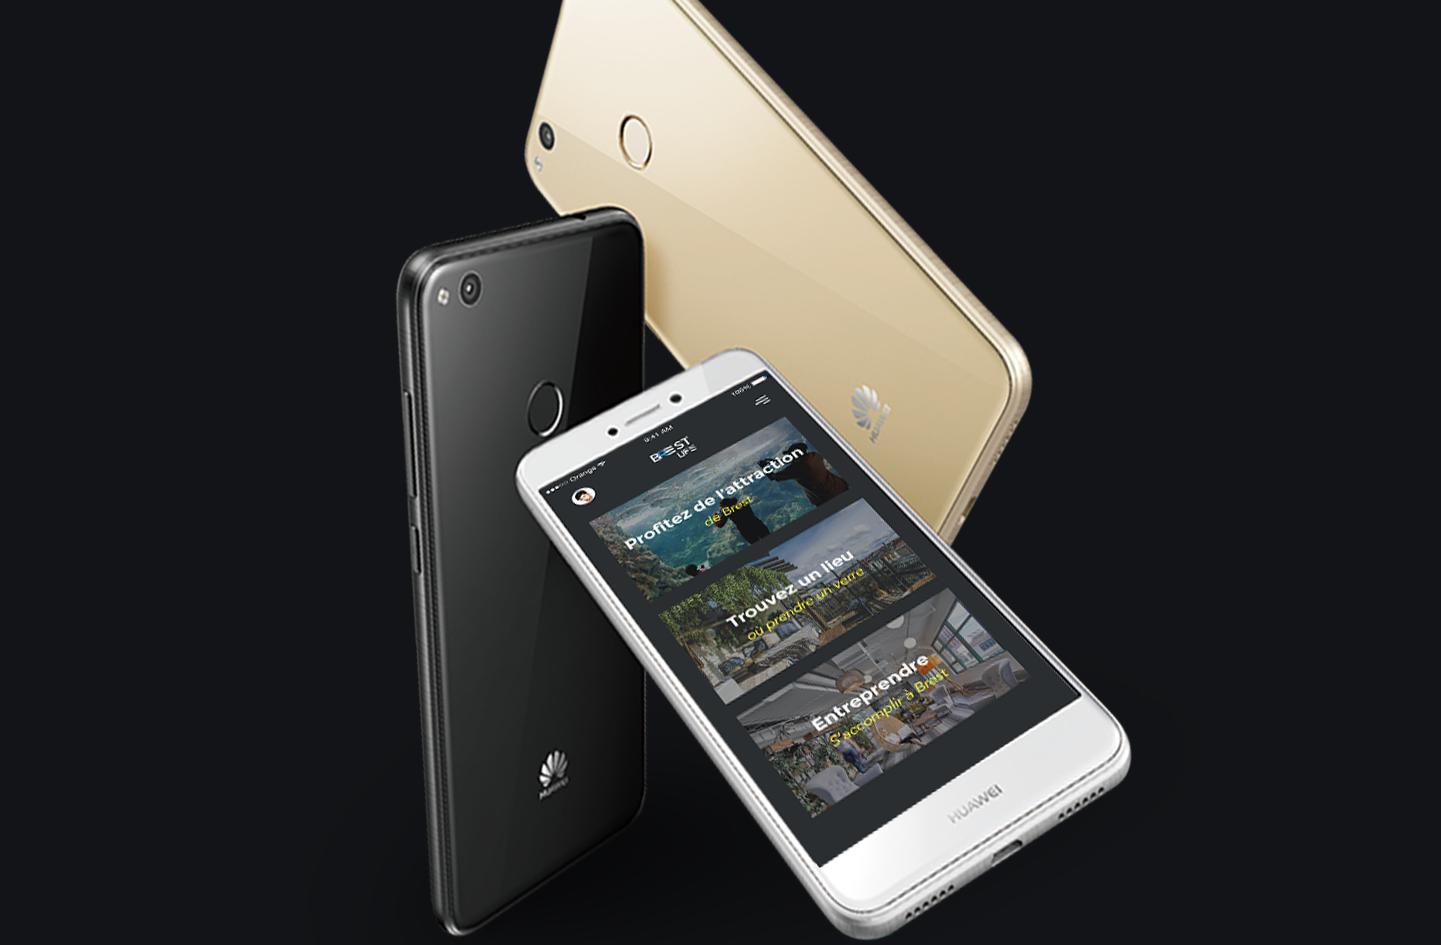 design studio développement mobile natif hybrid java swift ios android marketing brest likeweb paris